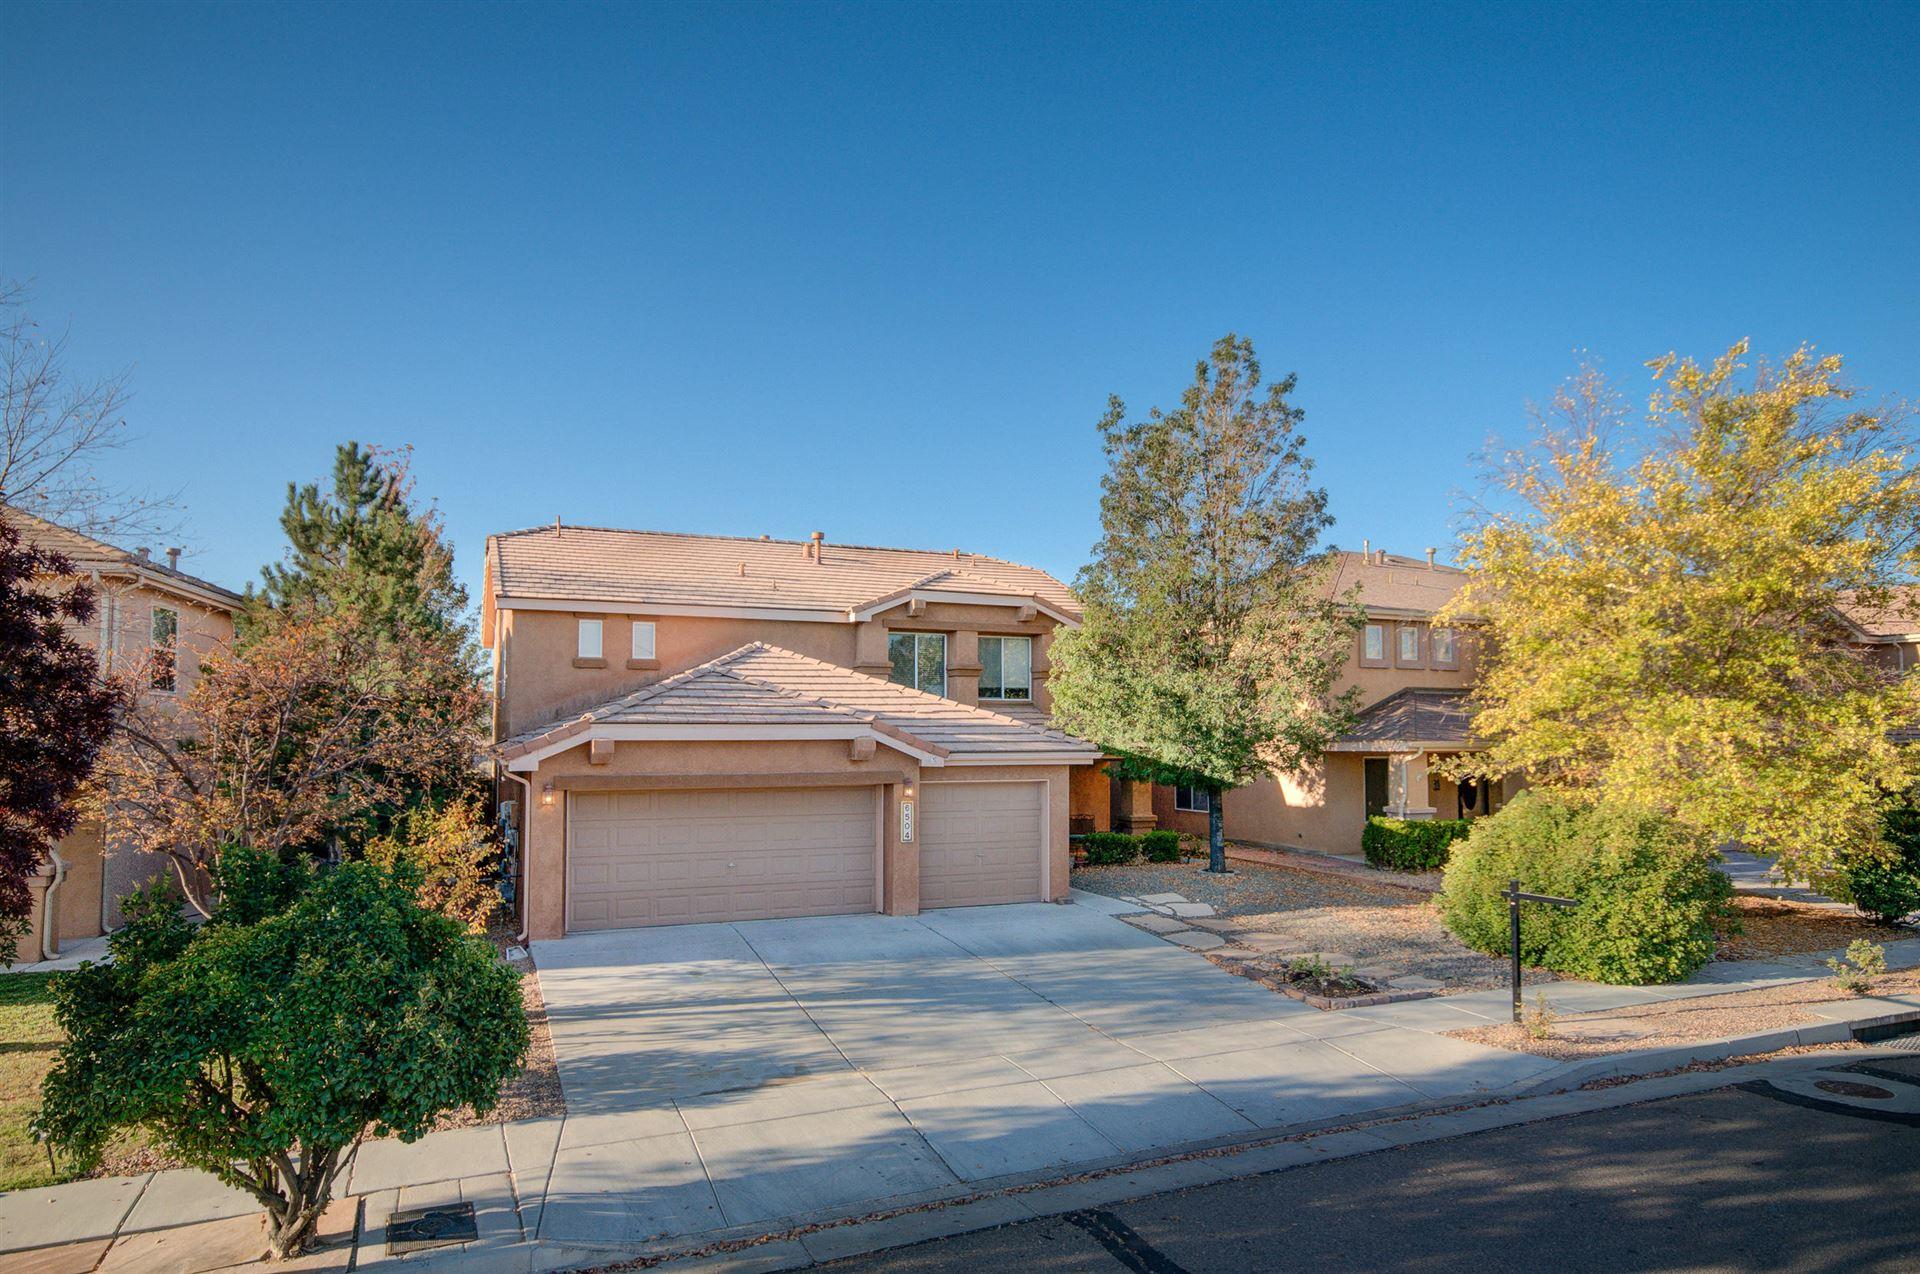 Photo of 6504 AVENIDA SEVILLE NW, Albuquerque, NM 87114 (MLS # 979456)